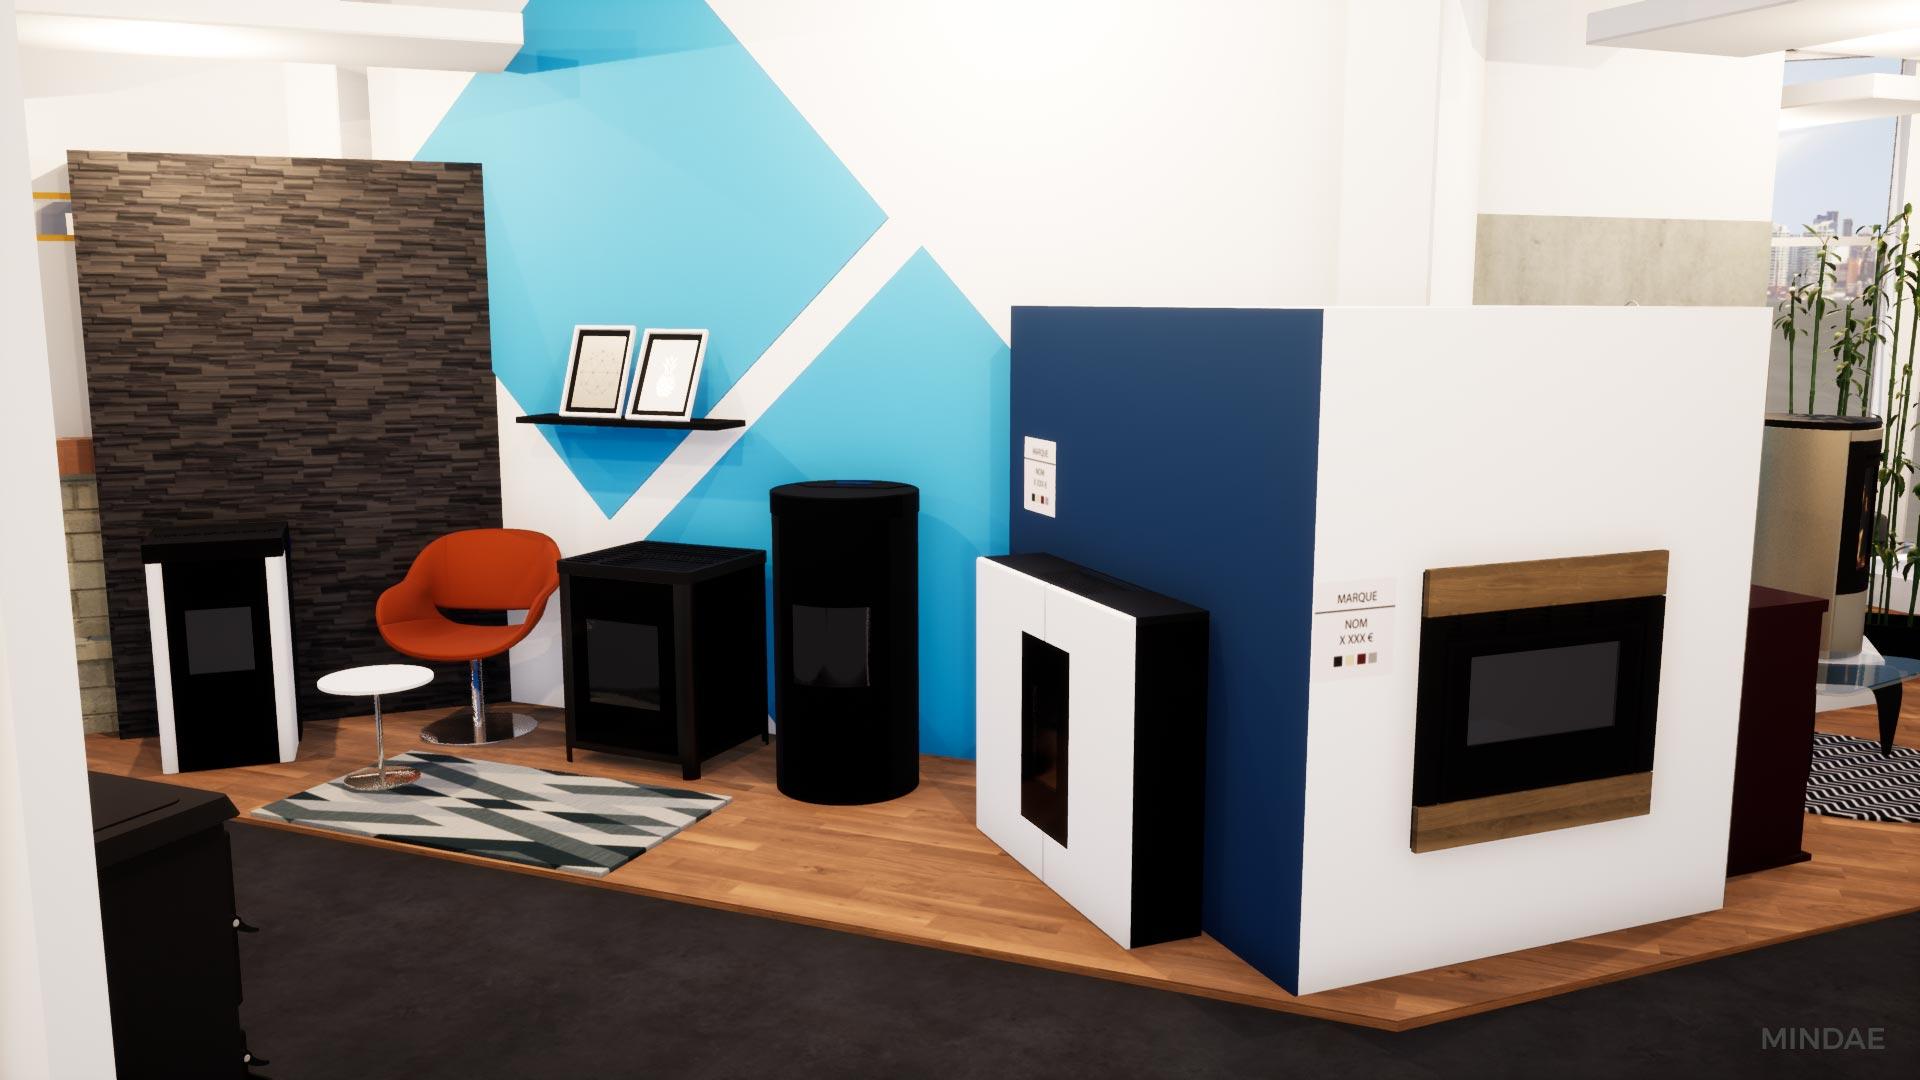 Mindae_3D_projet_agencement_poele_bois_cheminee_showroom_flamdesign_magasin_mondeville-(11)